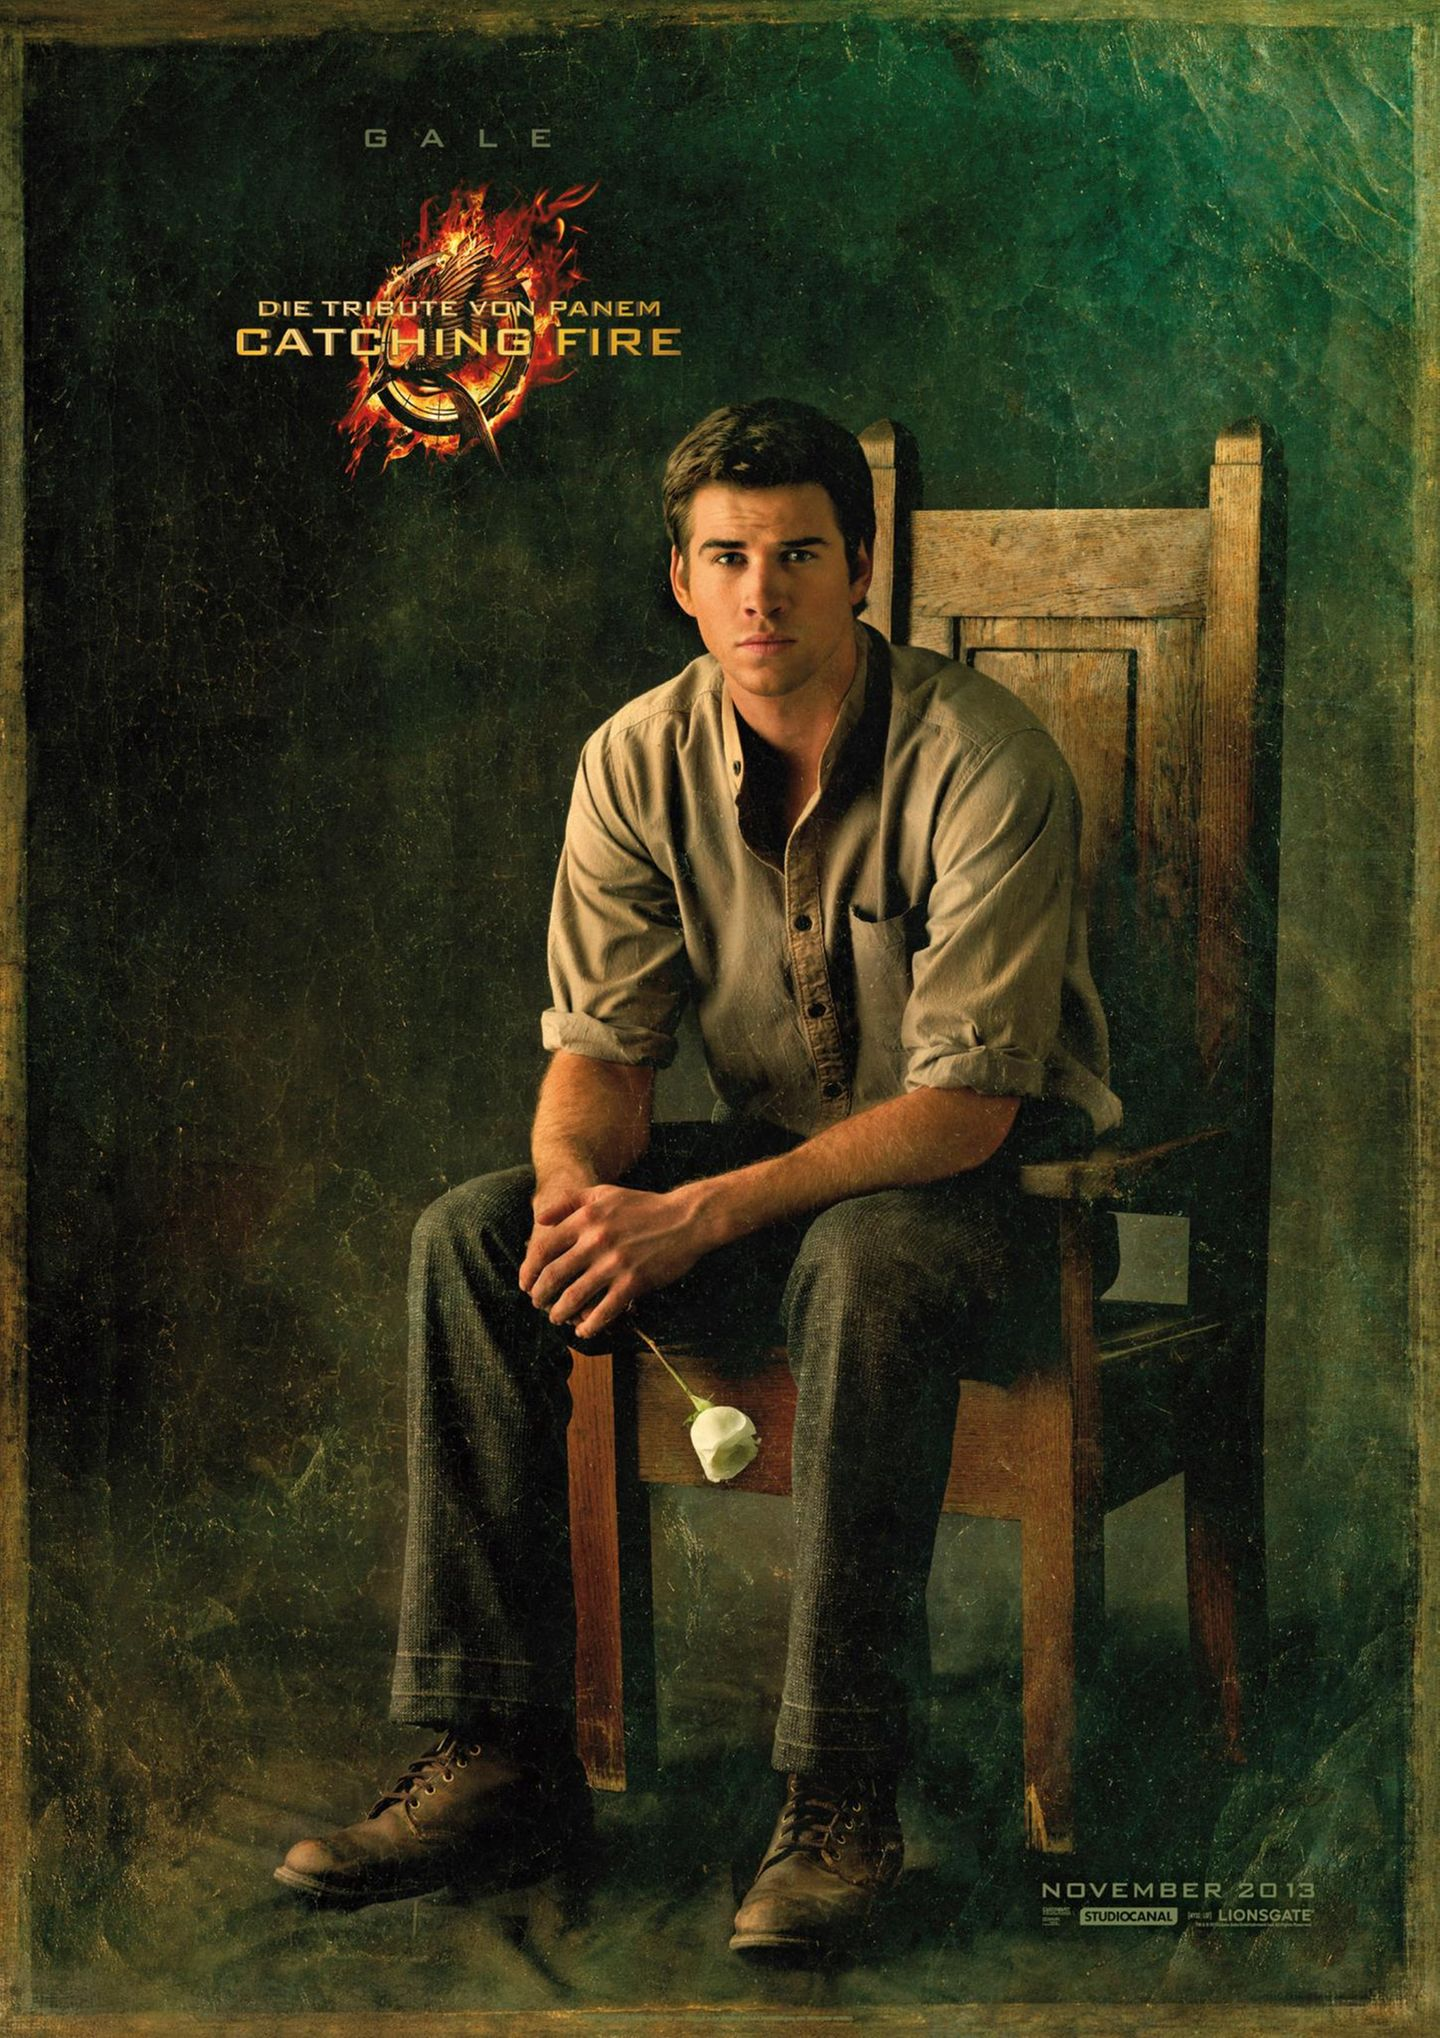 Gale (Liam Hemsworth)